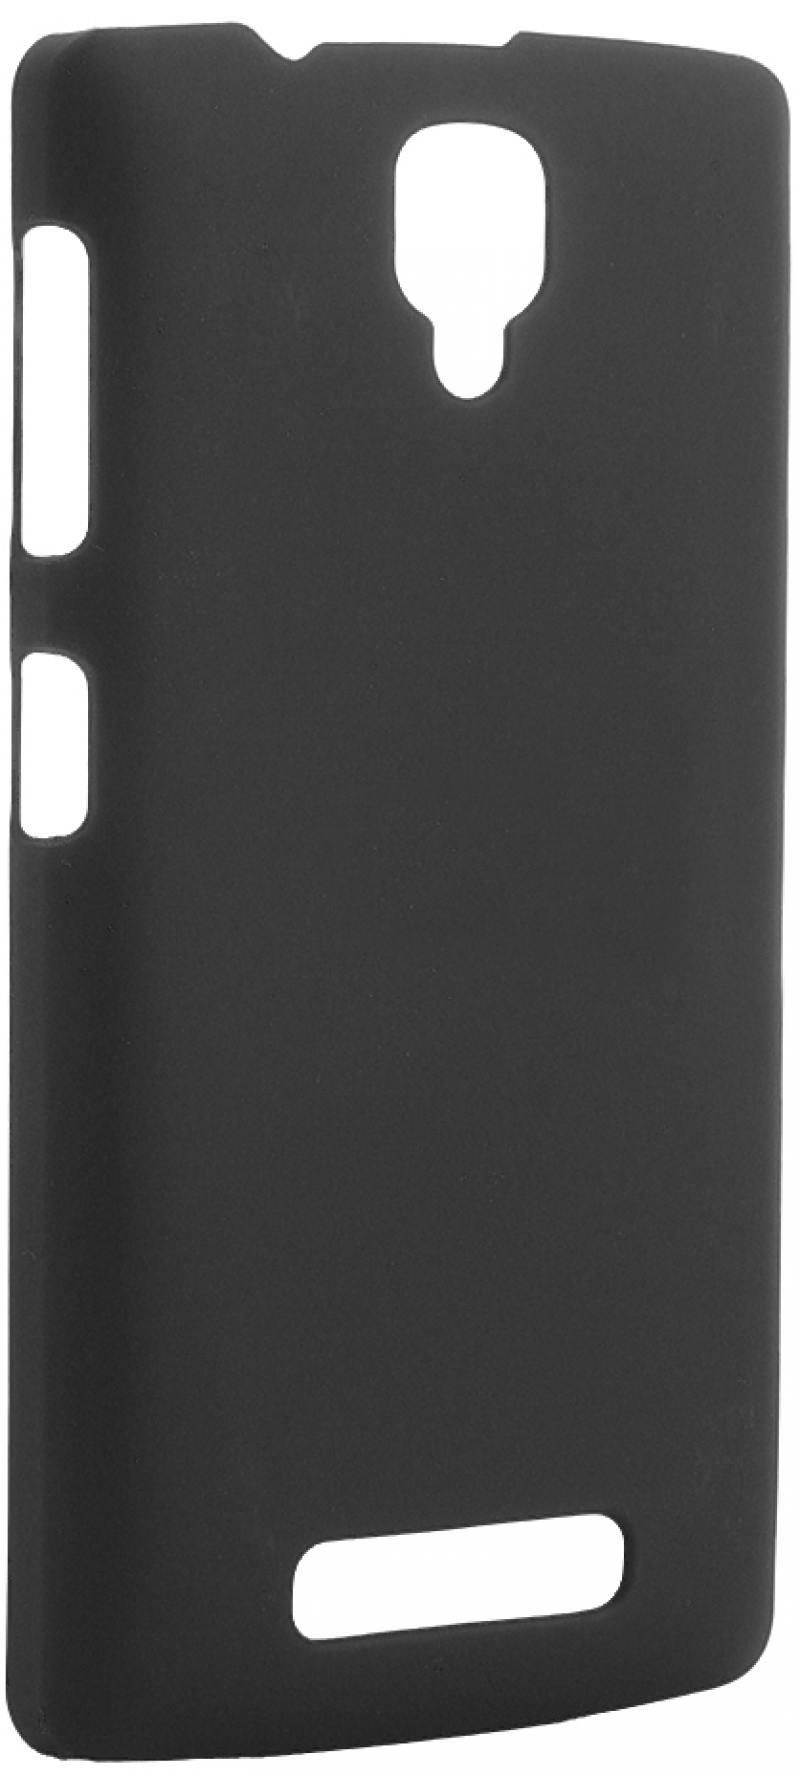 Чехол-накладка Pulsar CLIPCASE PC Soft-Touch для Lenovo A1000 (черная) чехол накладка pulsar clipcase pc soft touch для samsung galaxy e5 sm e500f ds черная рсс0014